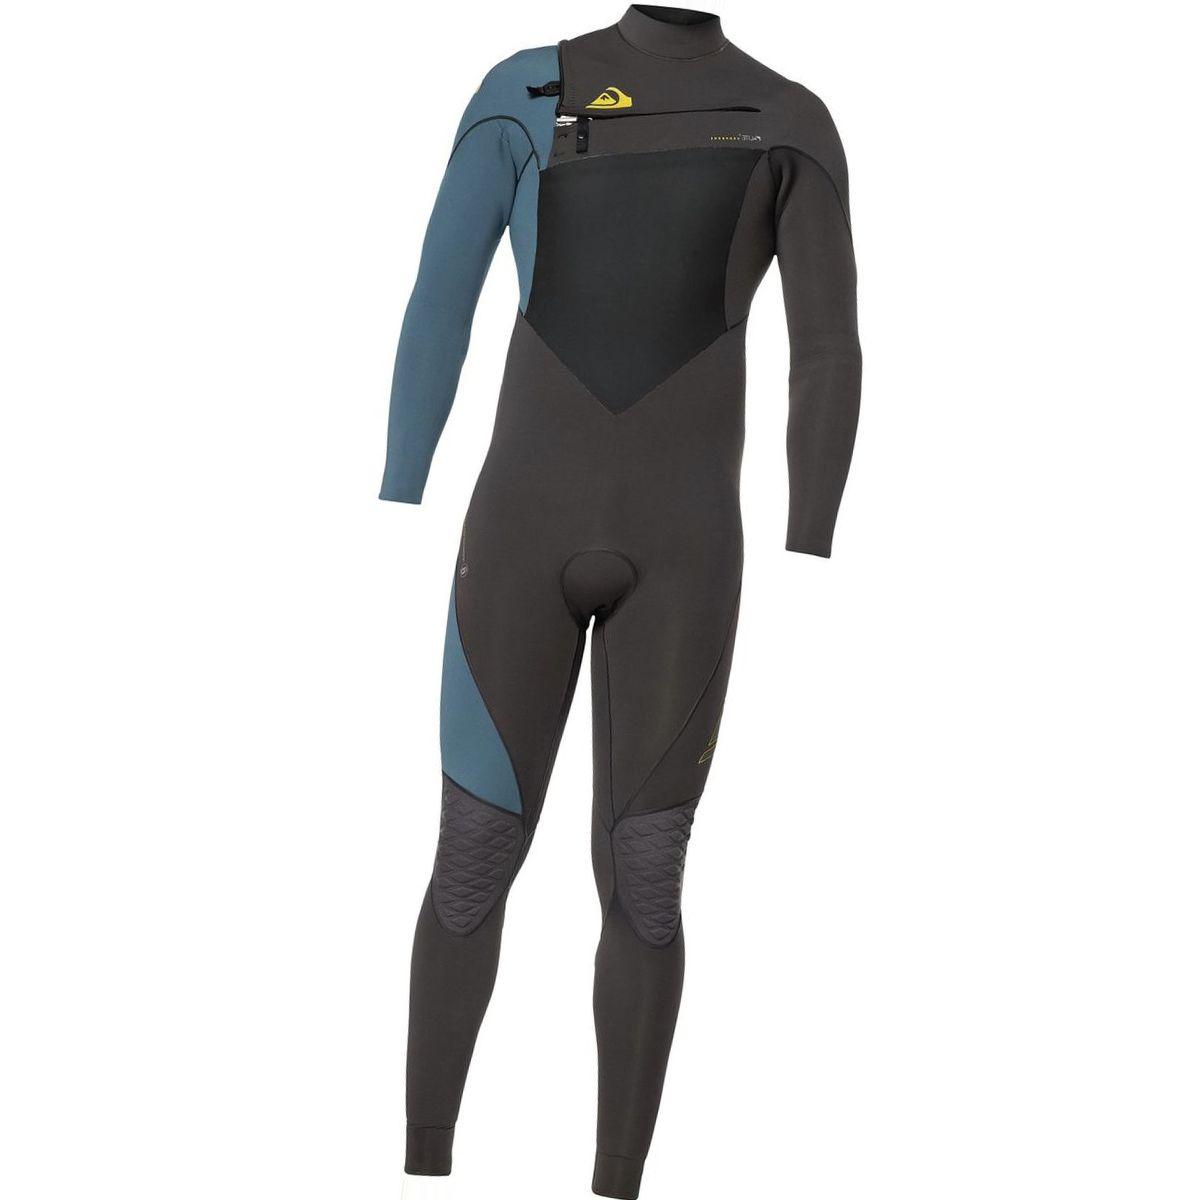 Quiksilver 4/3 Highline Plus Chest-Zip Hydrolock Wetsuit - Men's